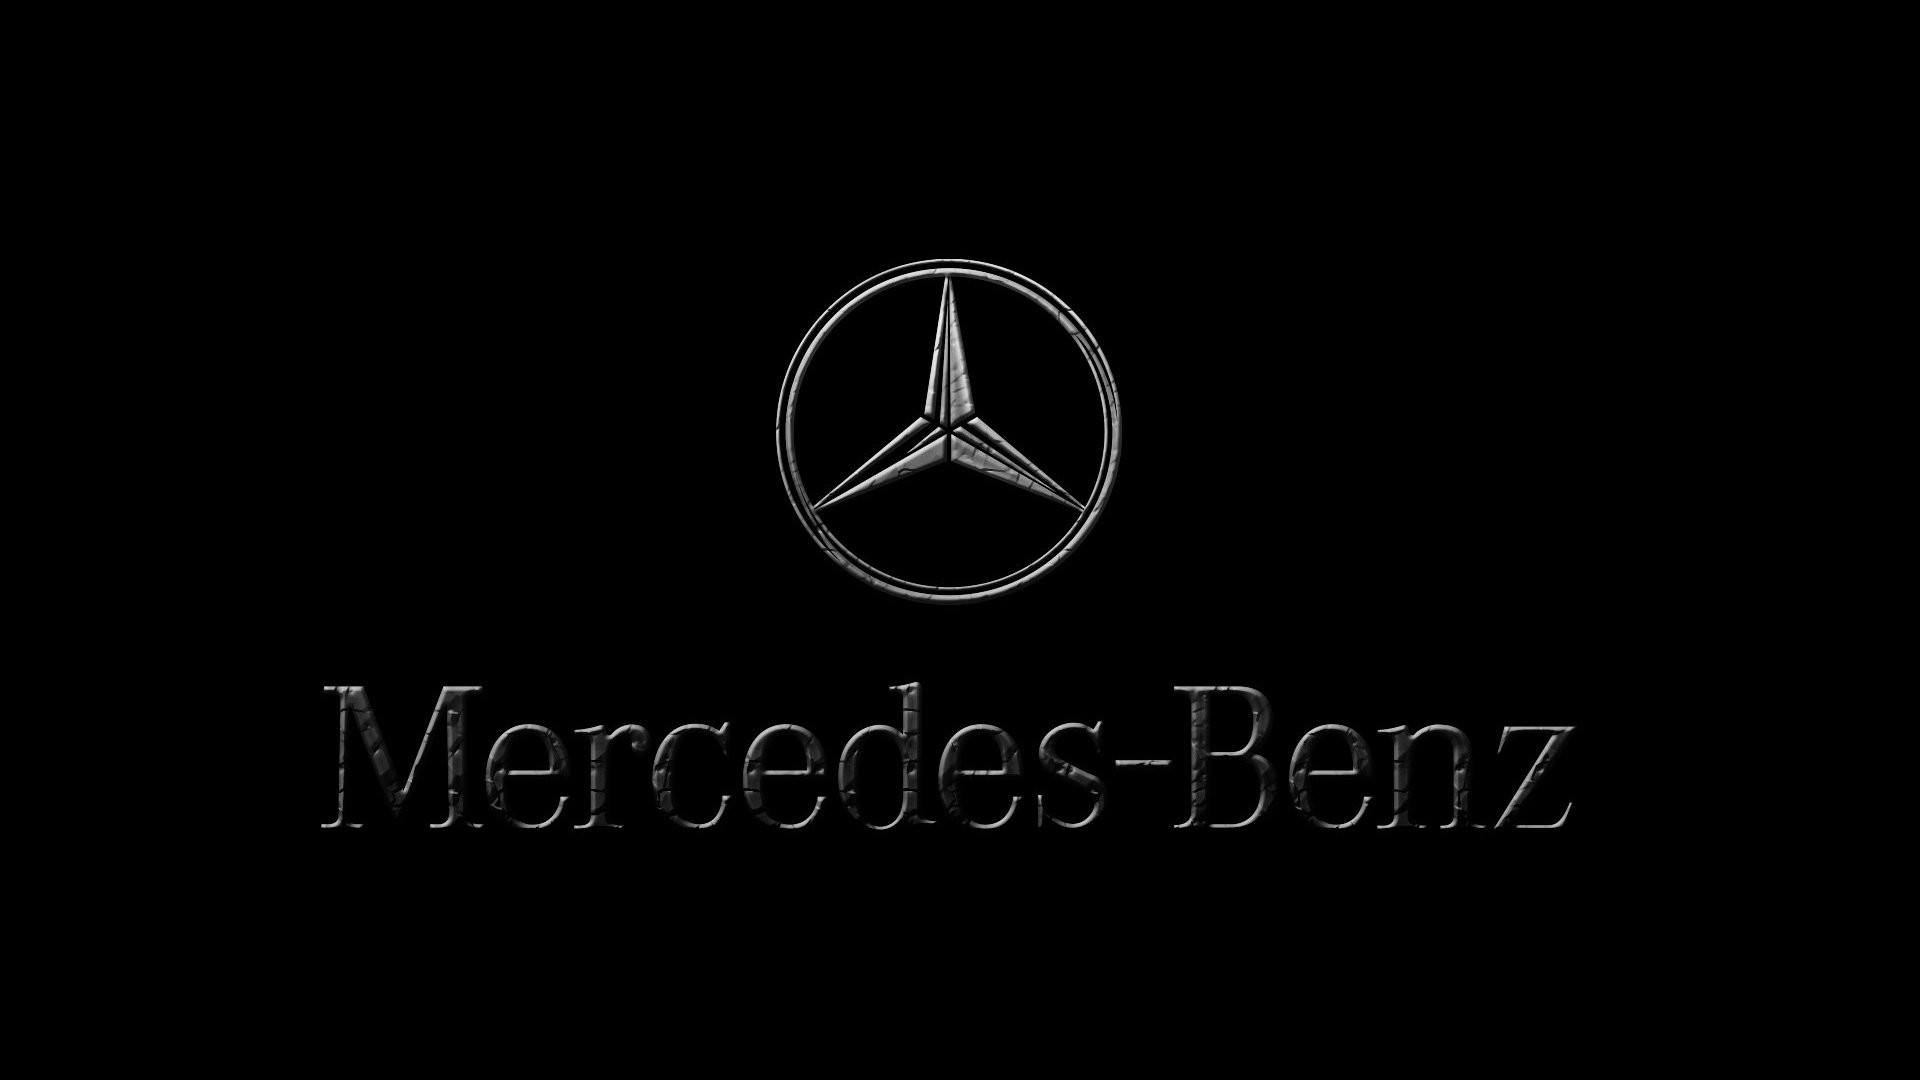 Mercedes Benz Logo Hd Heavenly Wallpaper Free Download Mercedes Benz Logo  Hd Heavenly Wallpaper